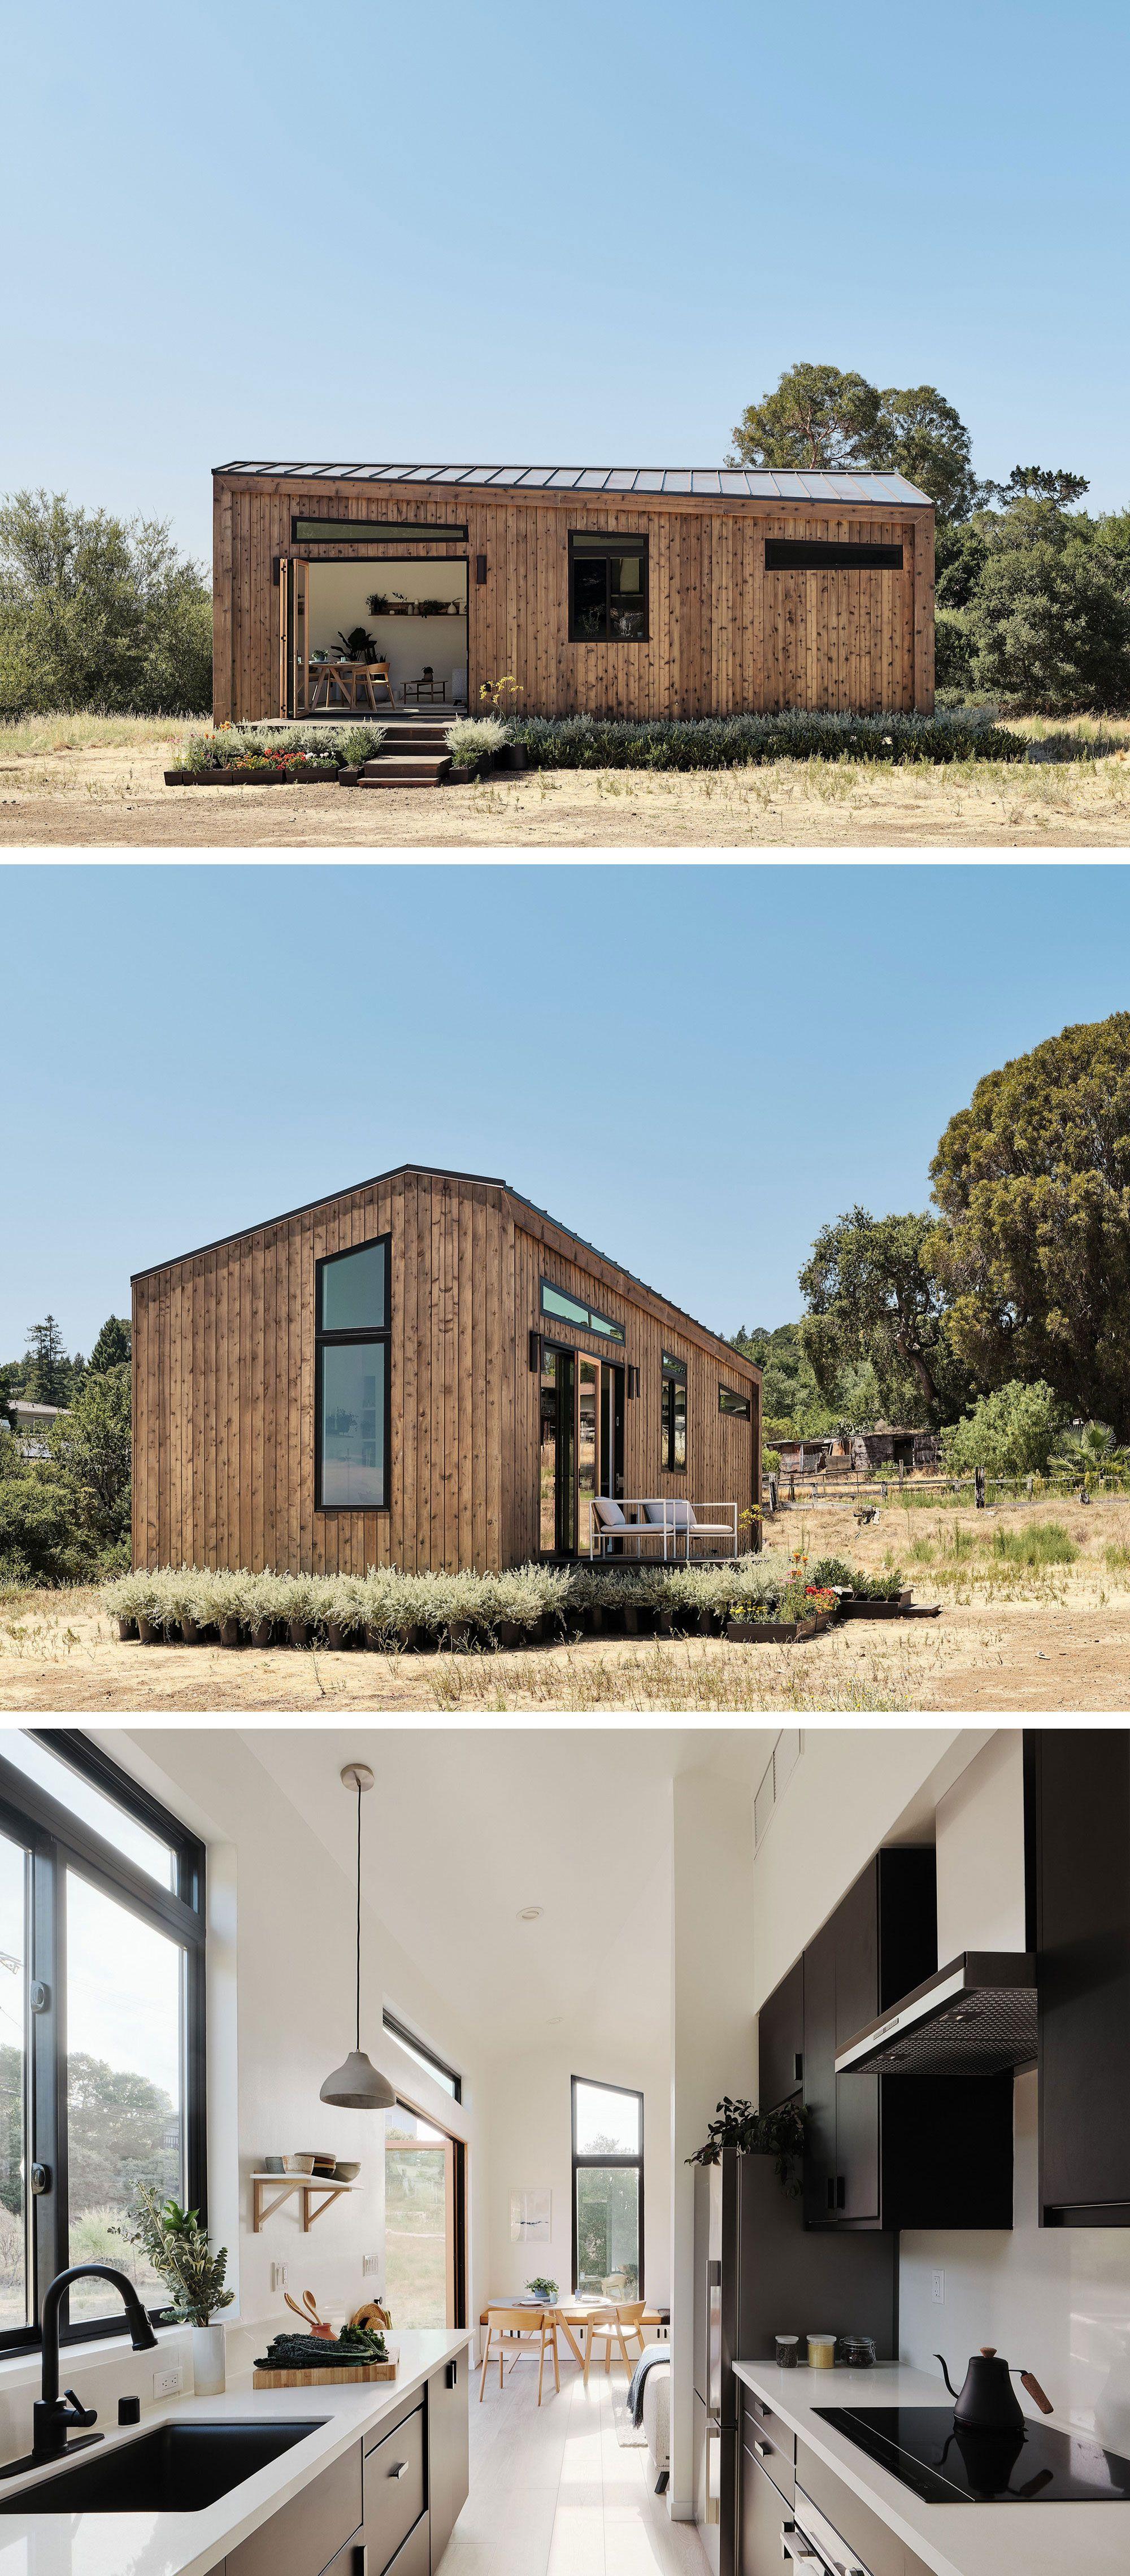 Koto X Abodu Modular Backyard Homes Gessato Prefab Homes Uk Building A Wooden House Prefab